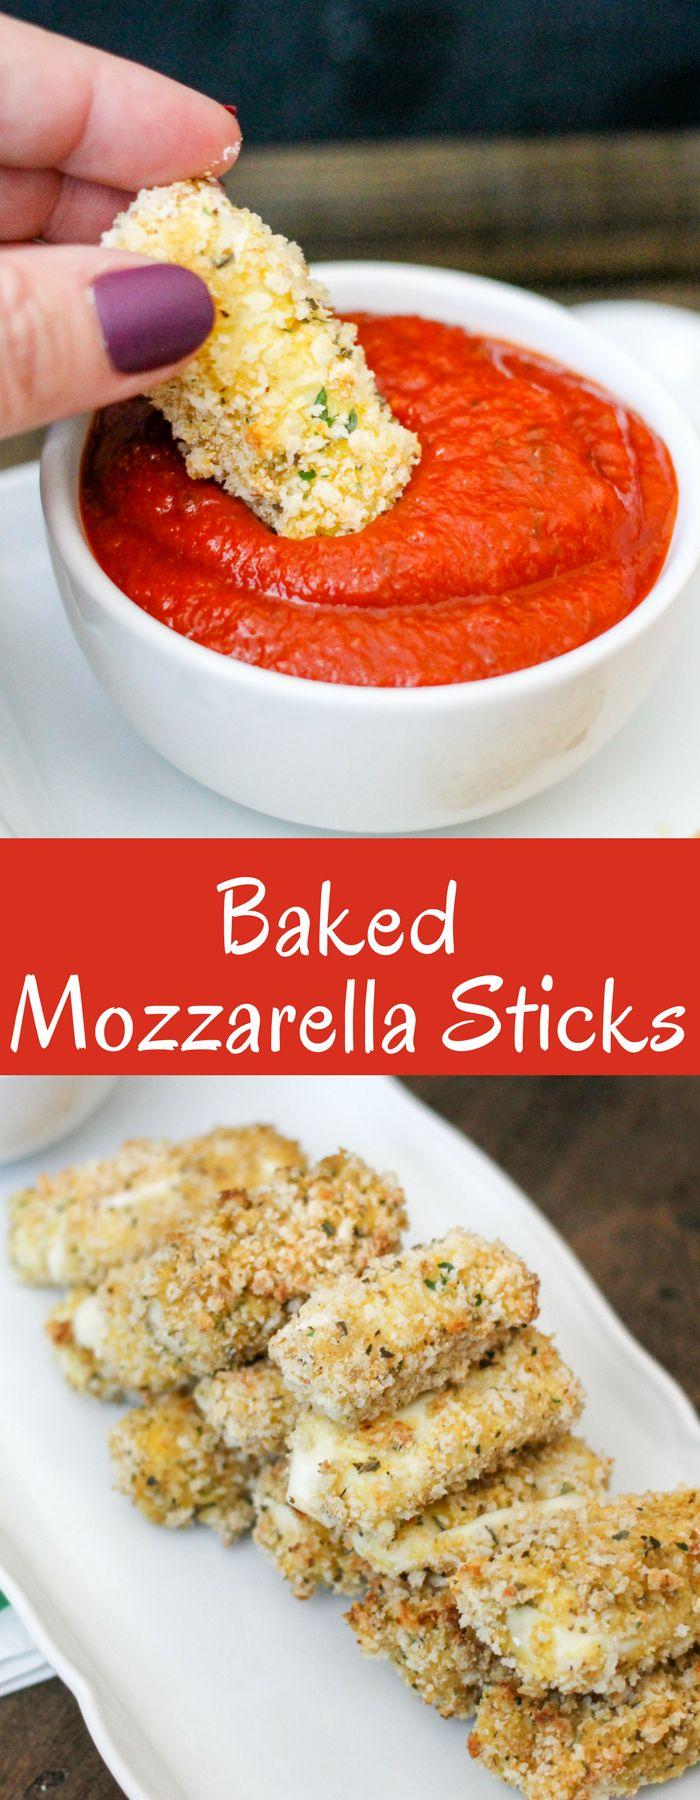 A healthier take on traditional fried mozzarella sticks, these Baked Mozzarella sticks are easy to make, crispy, and delicious!